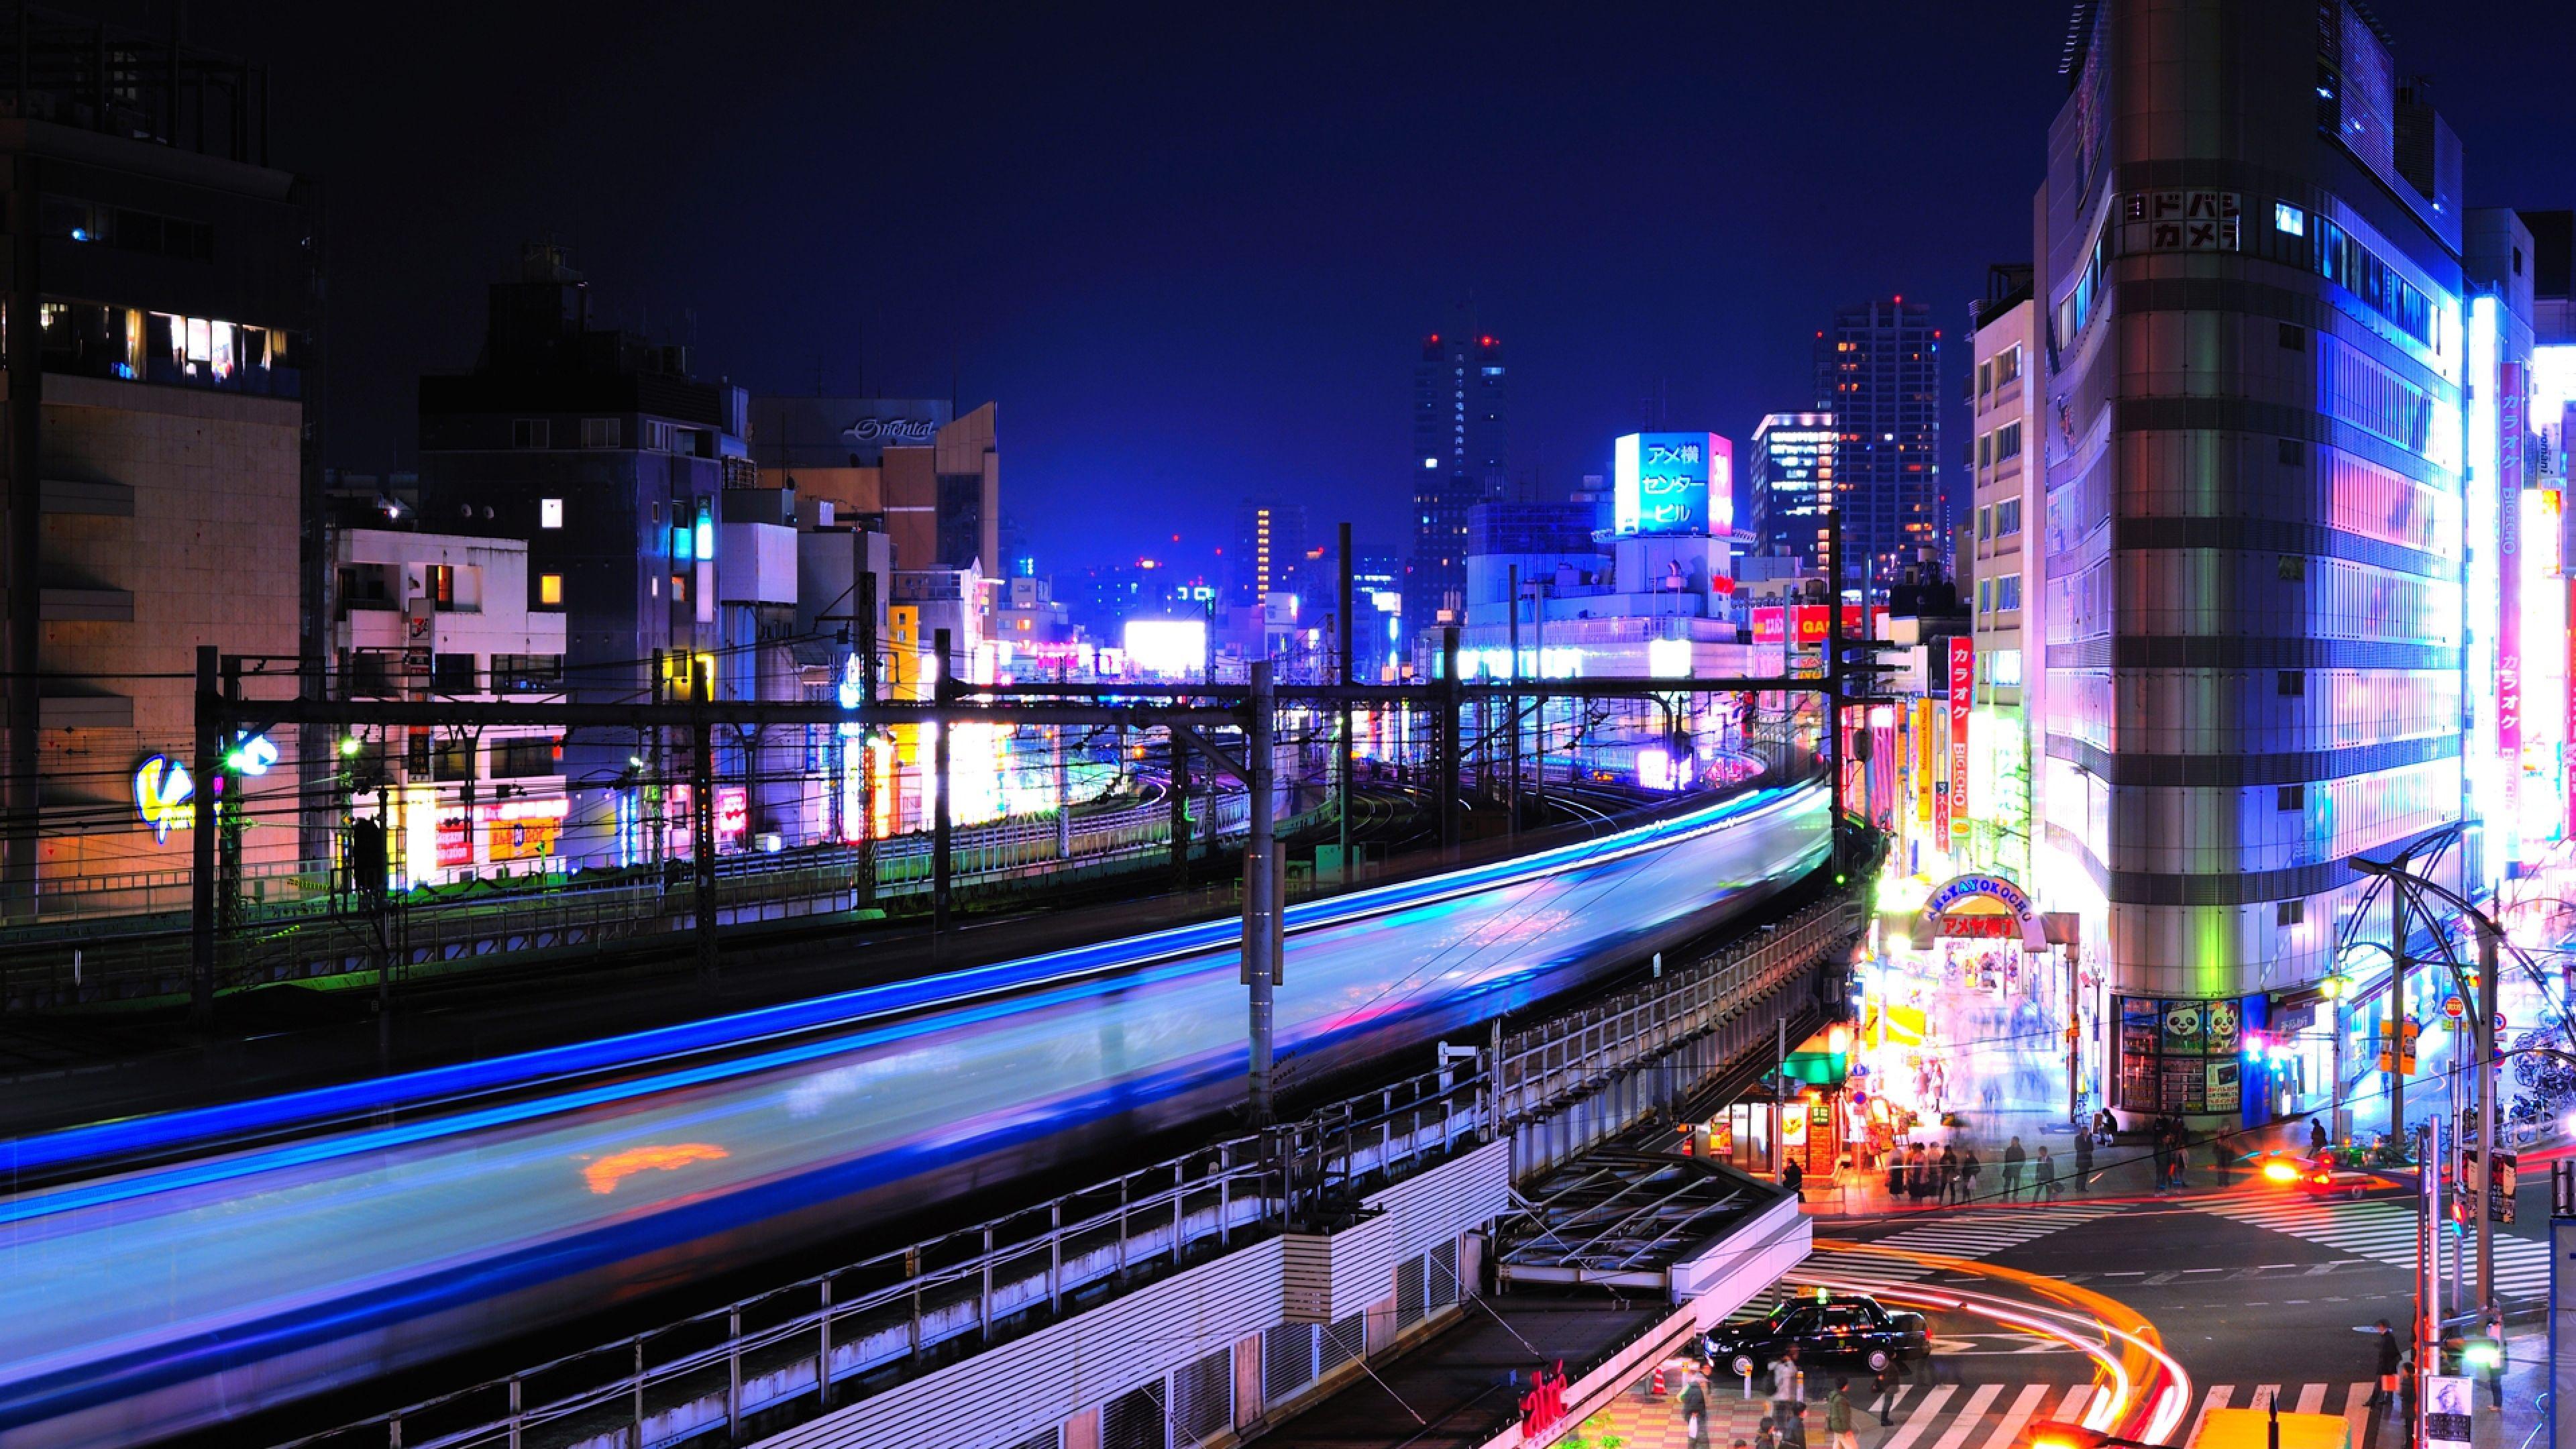 Download Wallpaper 3840x2160 Night Lights Buildings Railway Station Ueno Tokyo 4k Ultra Hd Hd Background Wallpaper 3840x2160 Pinterest